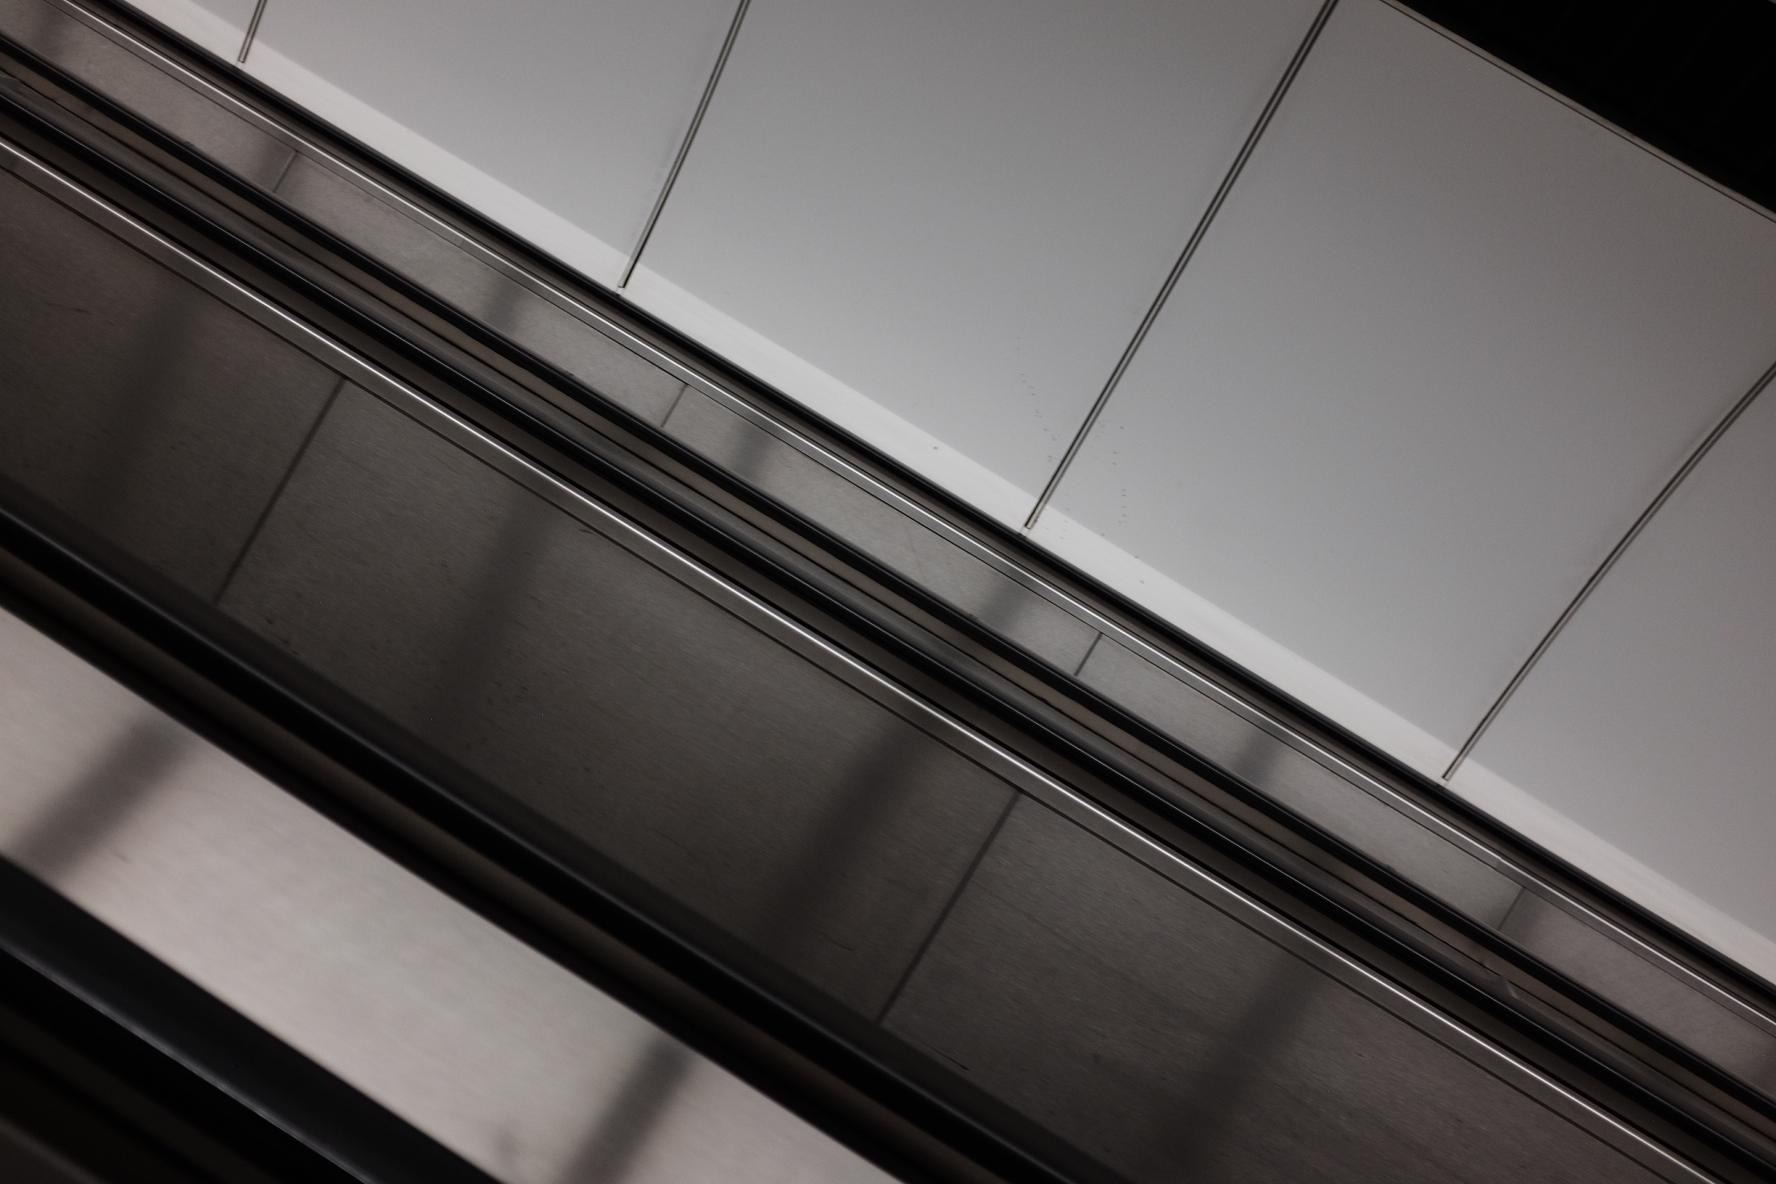 Diagonal lines, Wien 2019